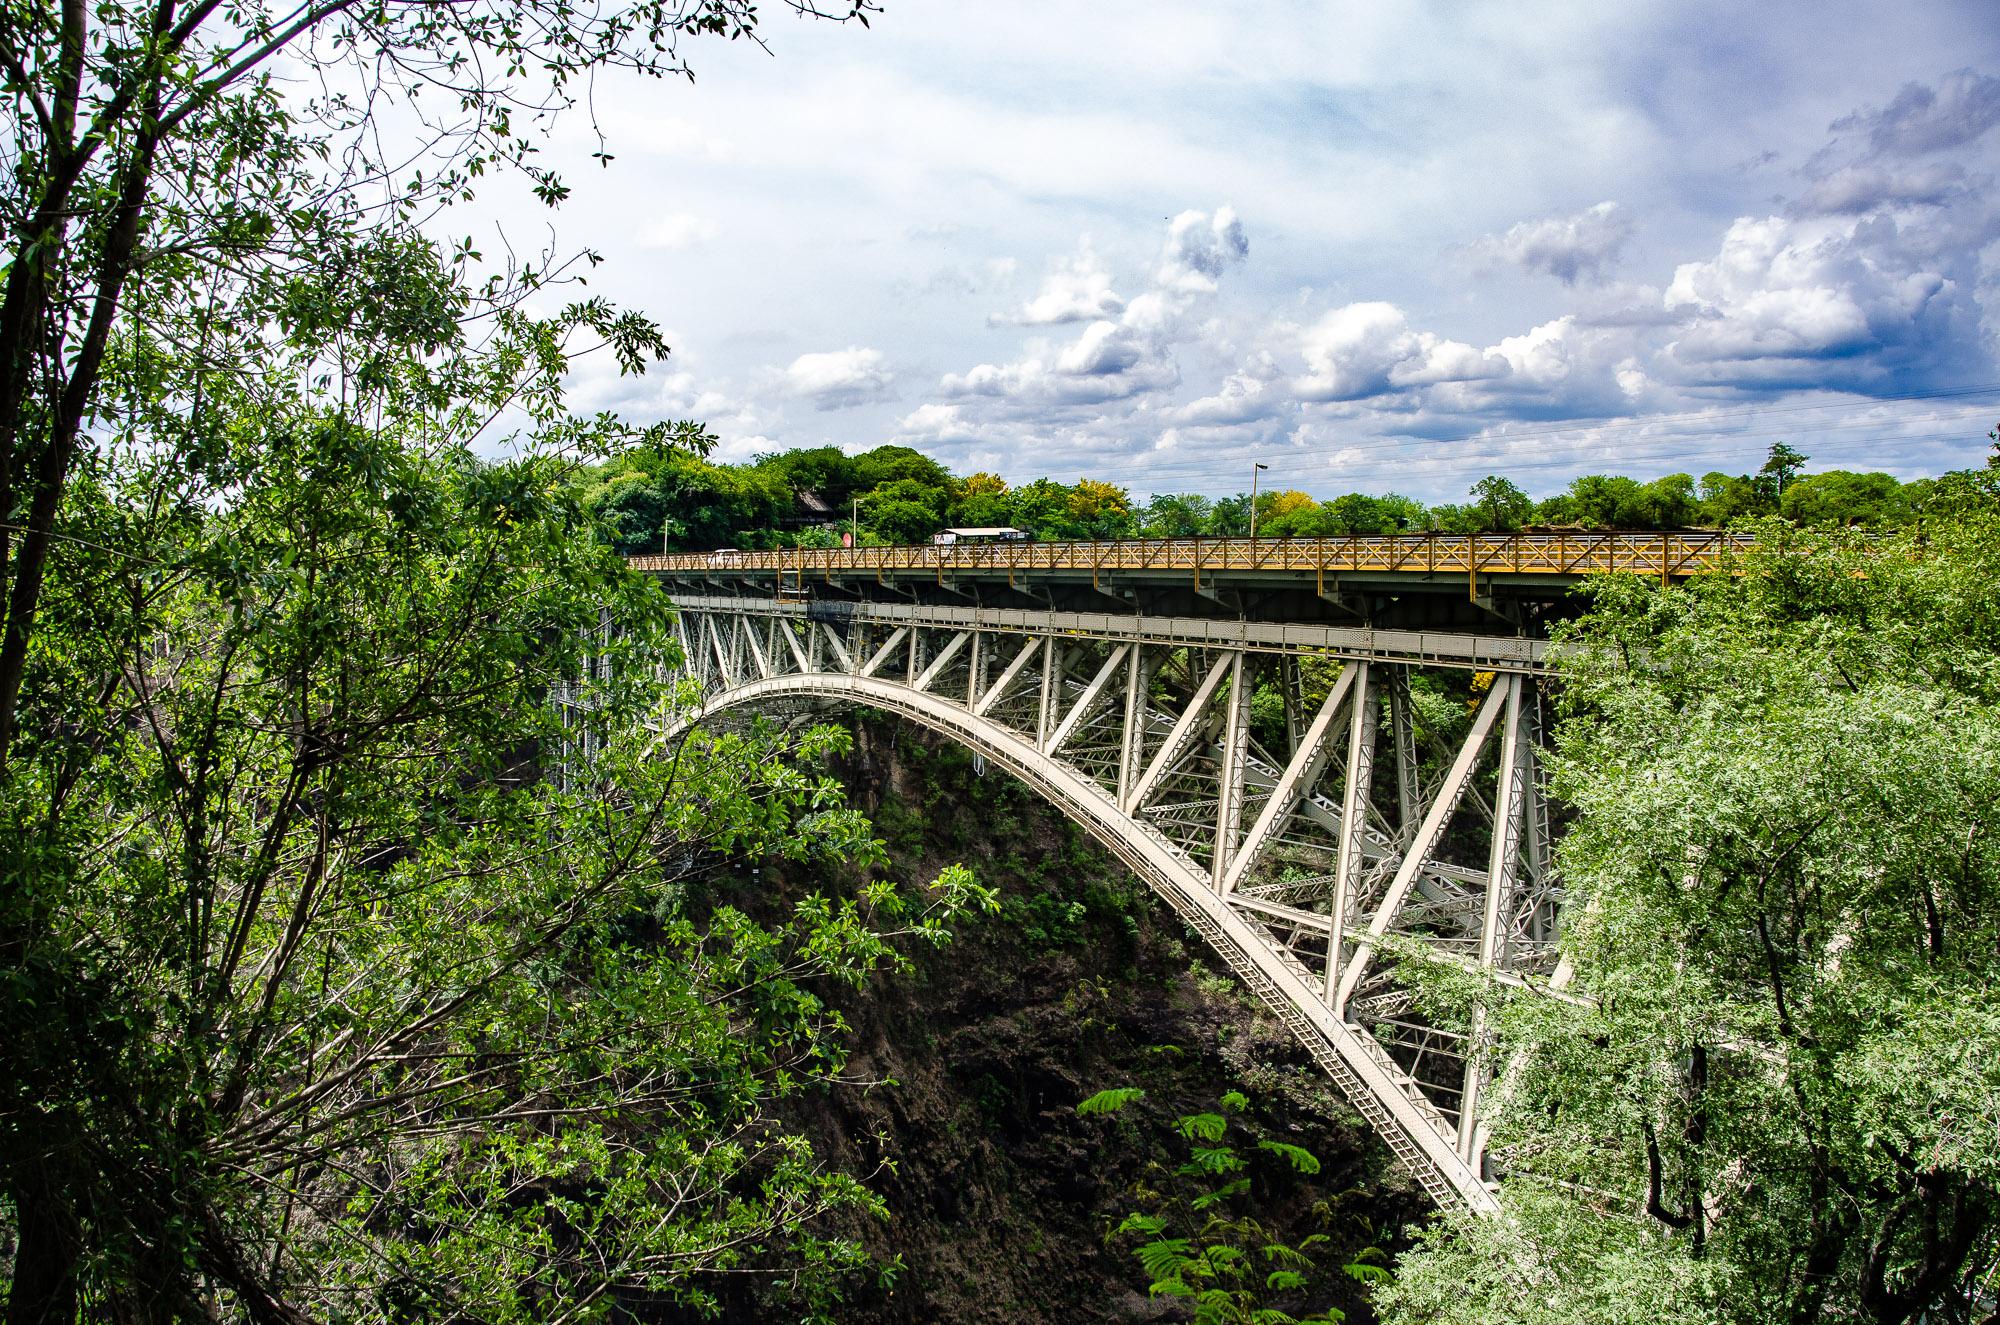 bungee pont - les chutes victoria - Zimbabwe, les chutes Victoria et plus encore! - afrique, zimbabwe